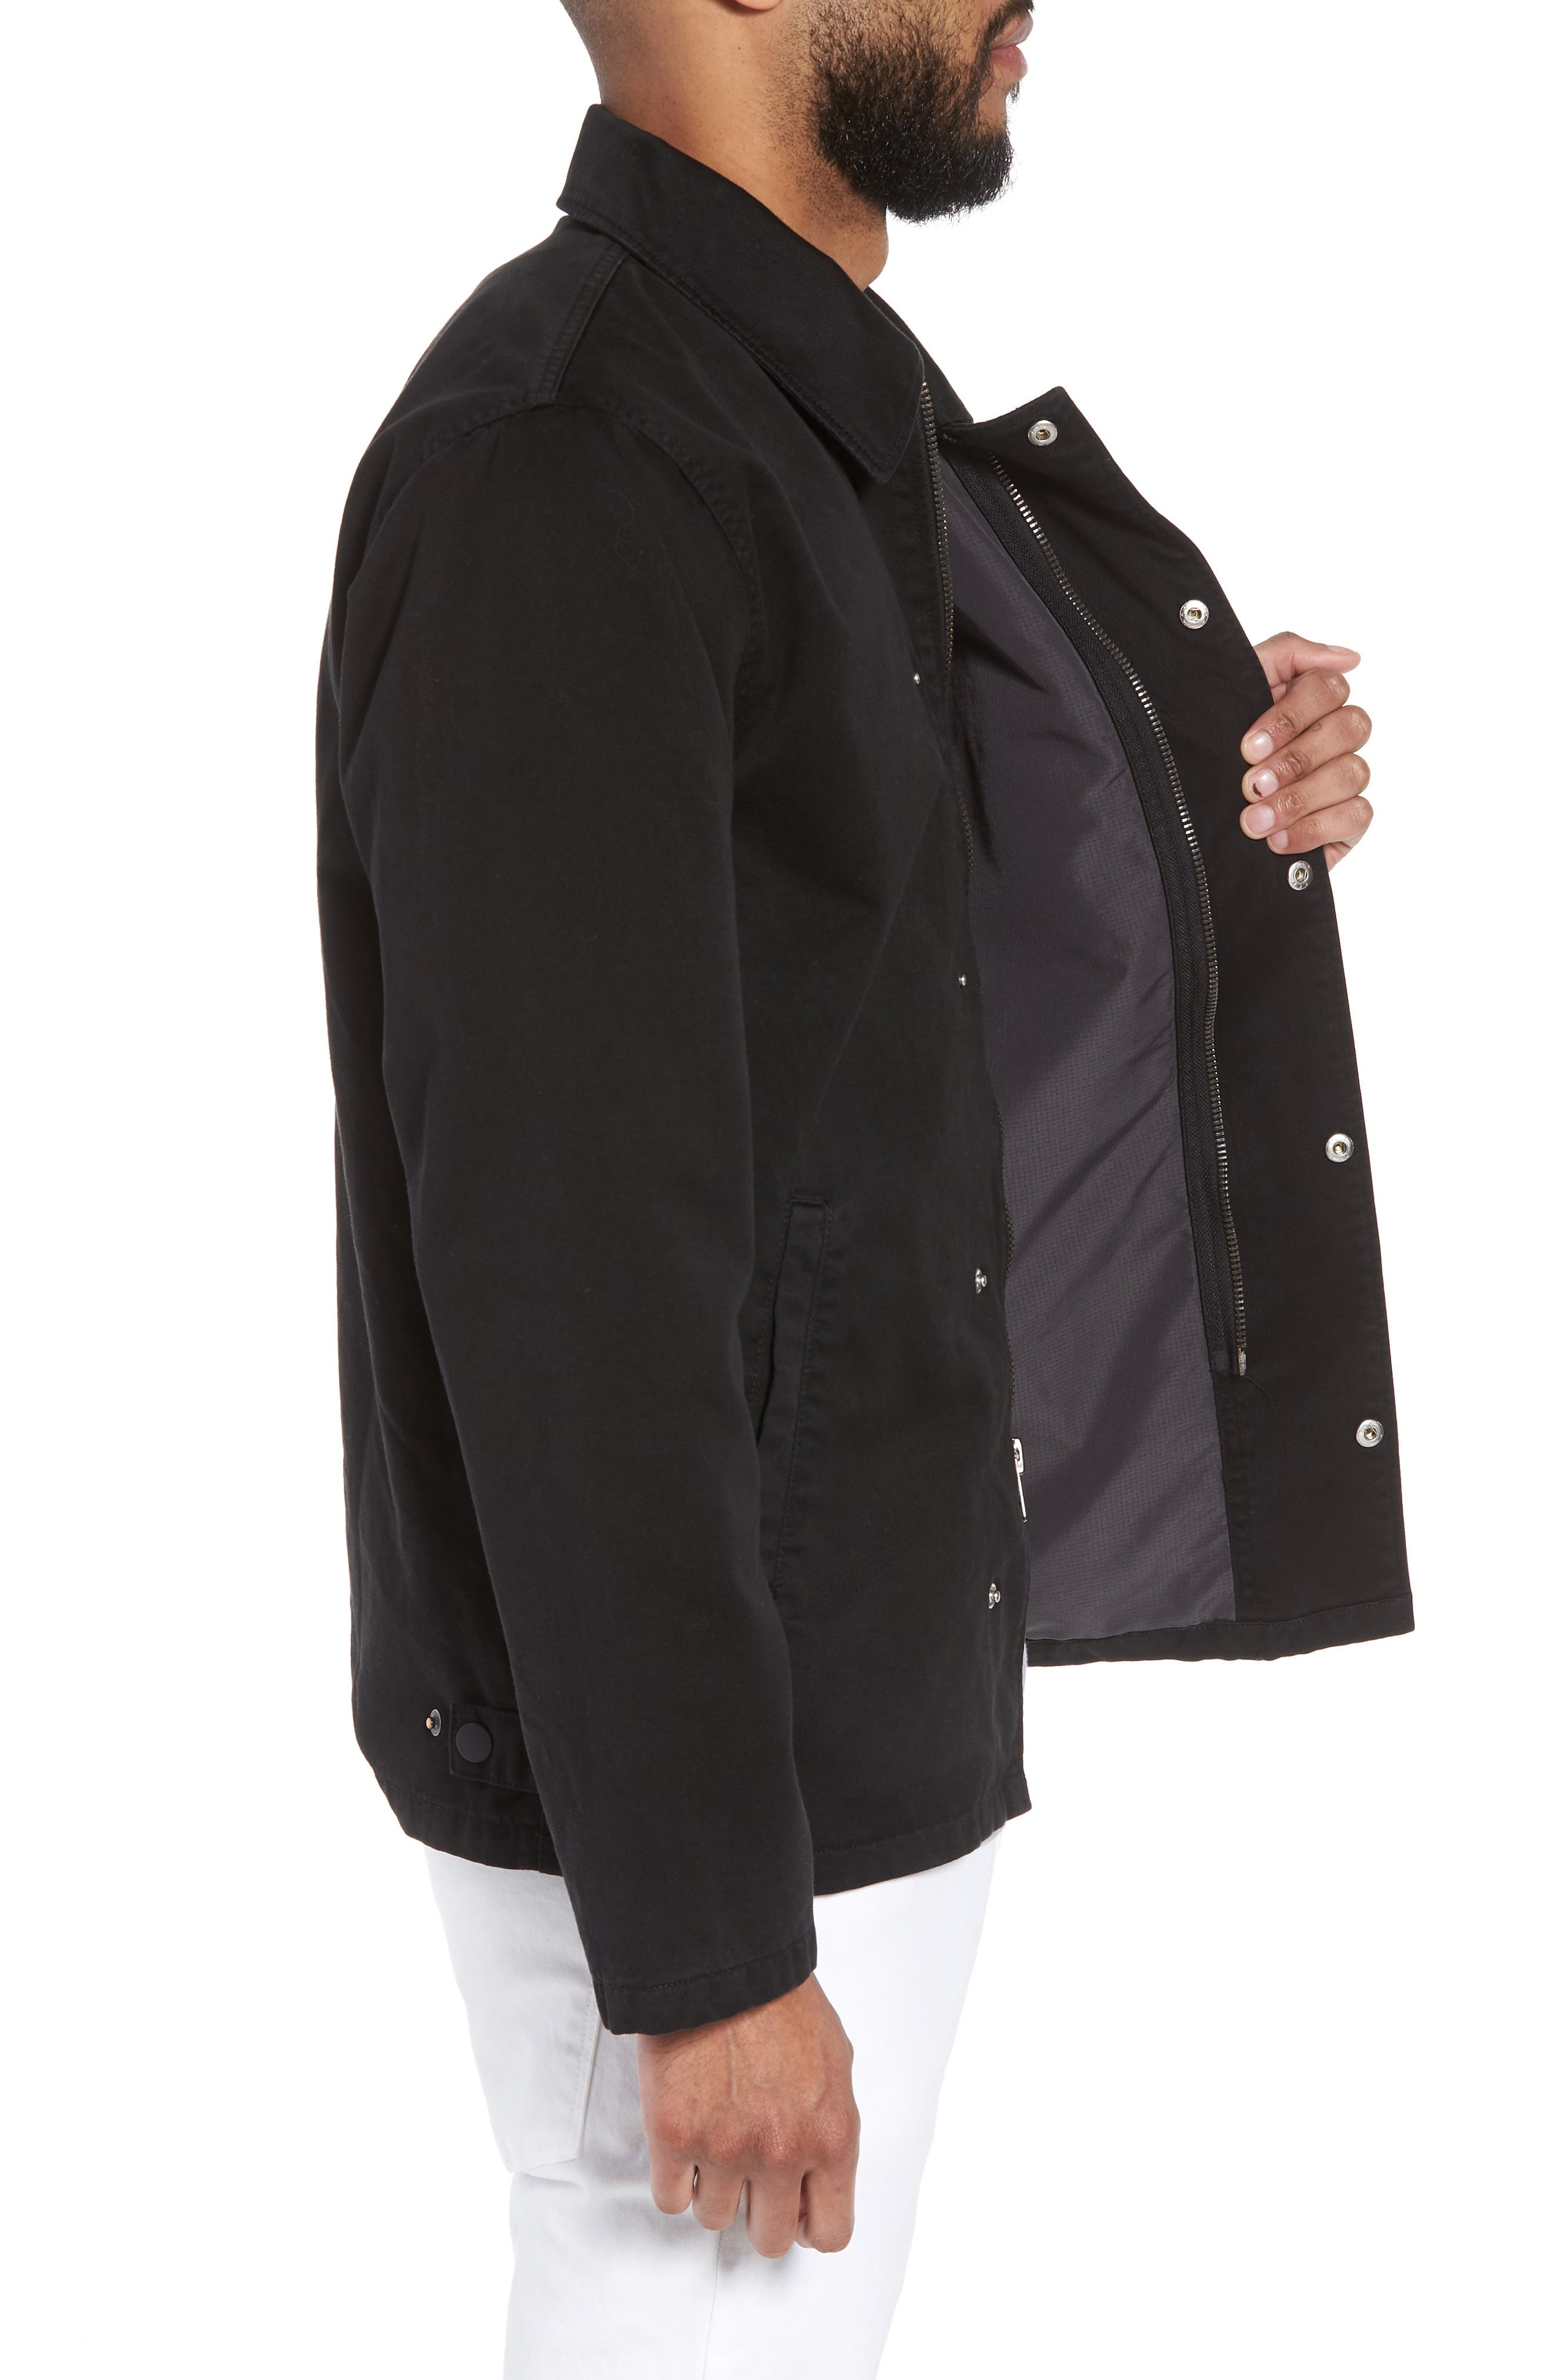 Hudson Military Jacket,                             Alternate thumbnail 3, color,                             001